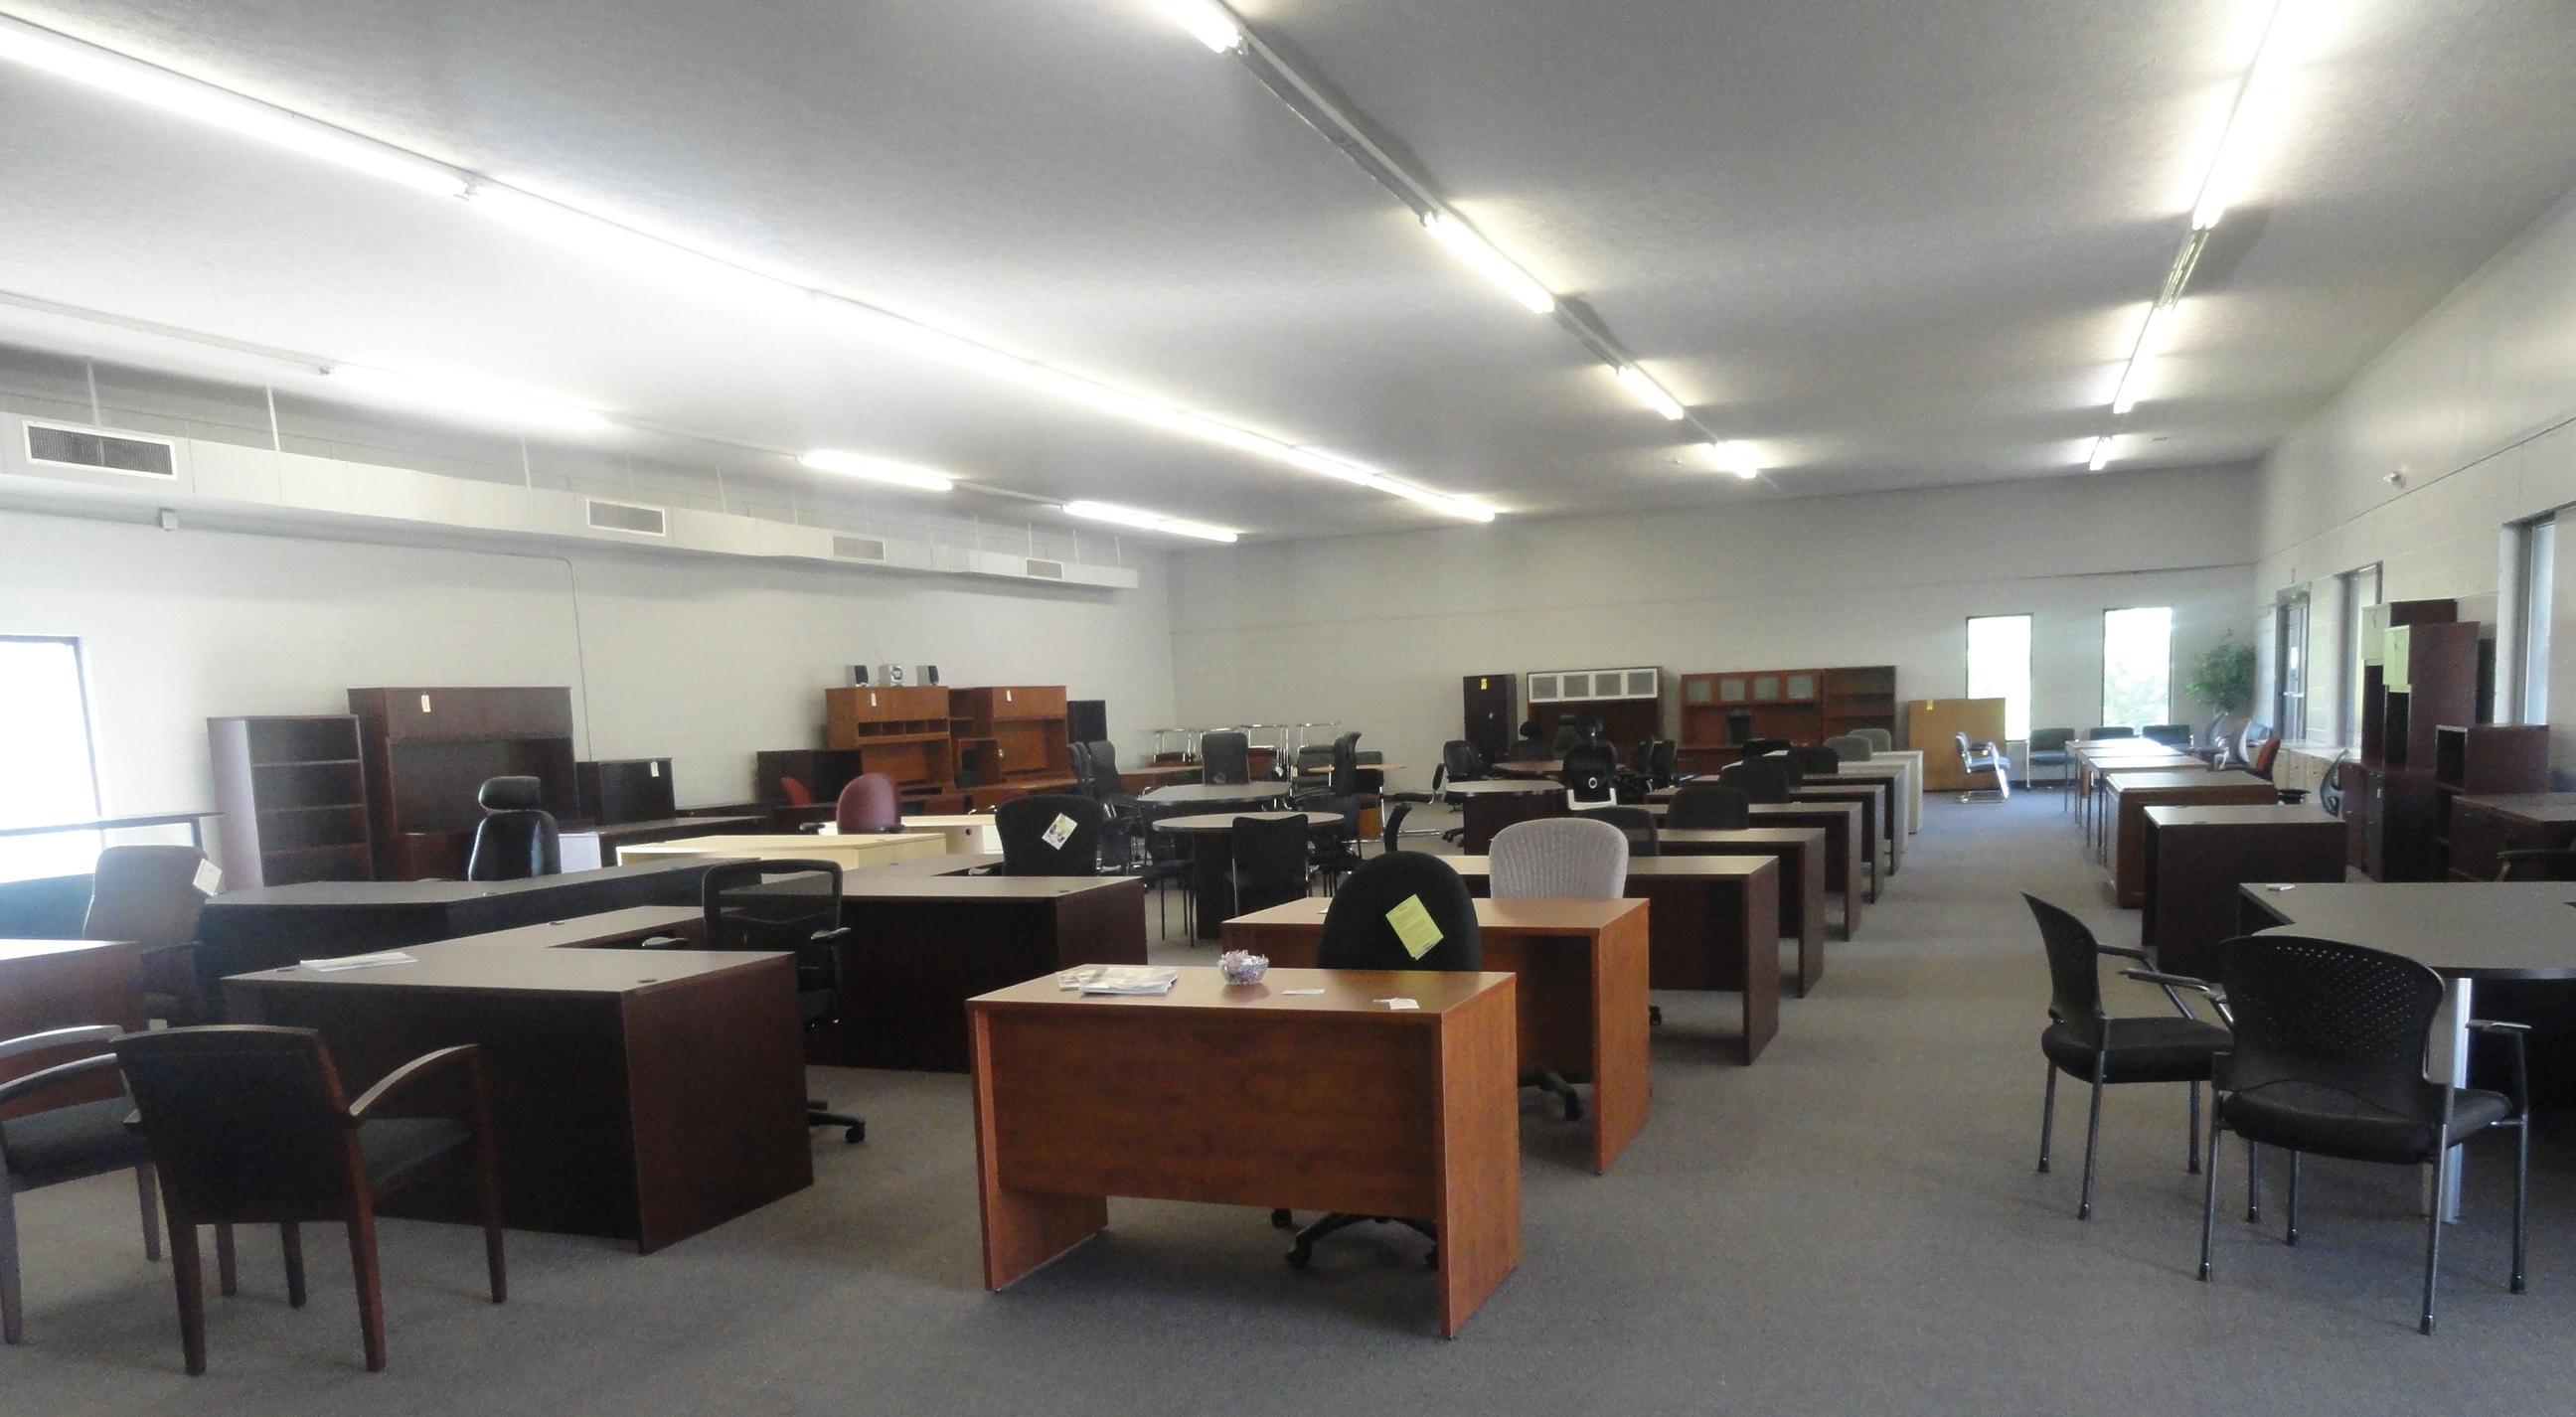 Corporate fice Furniture Louisville KY YP